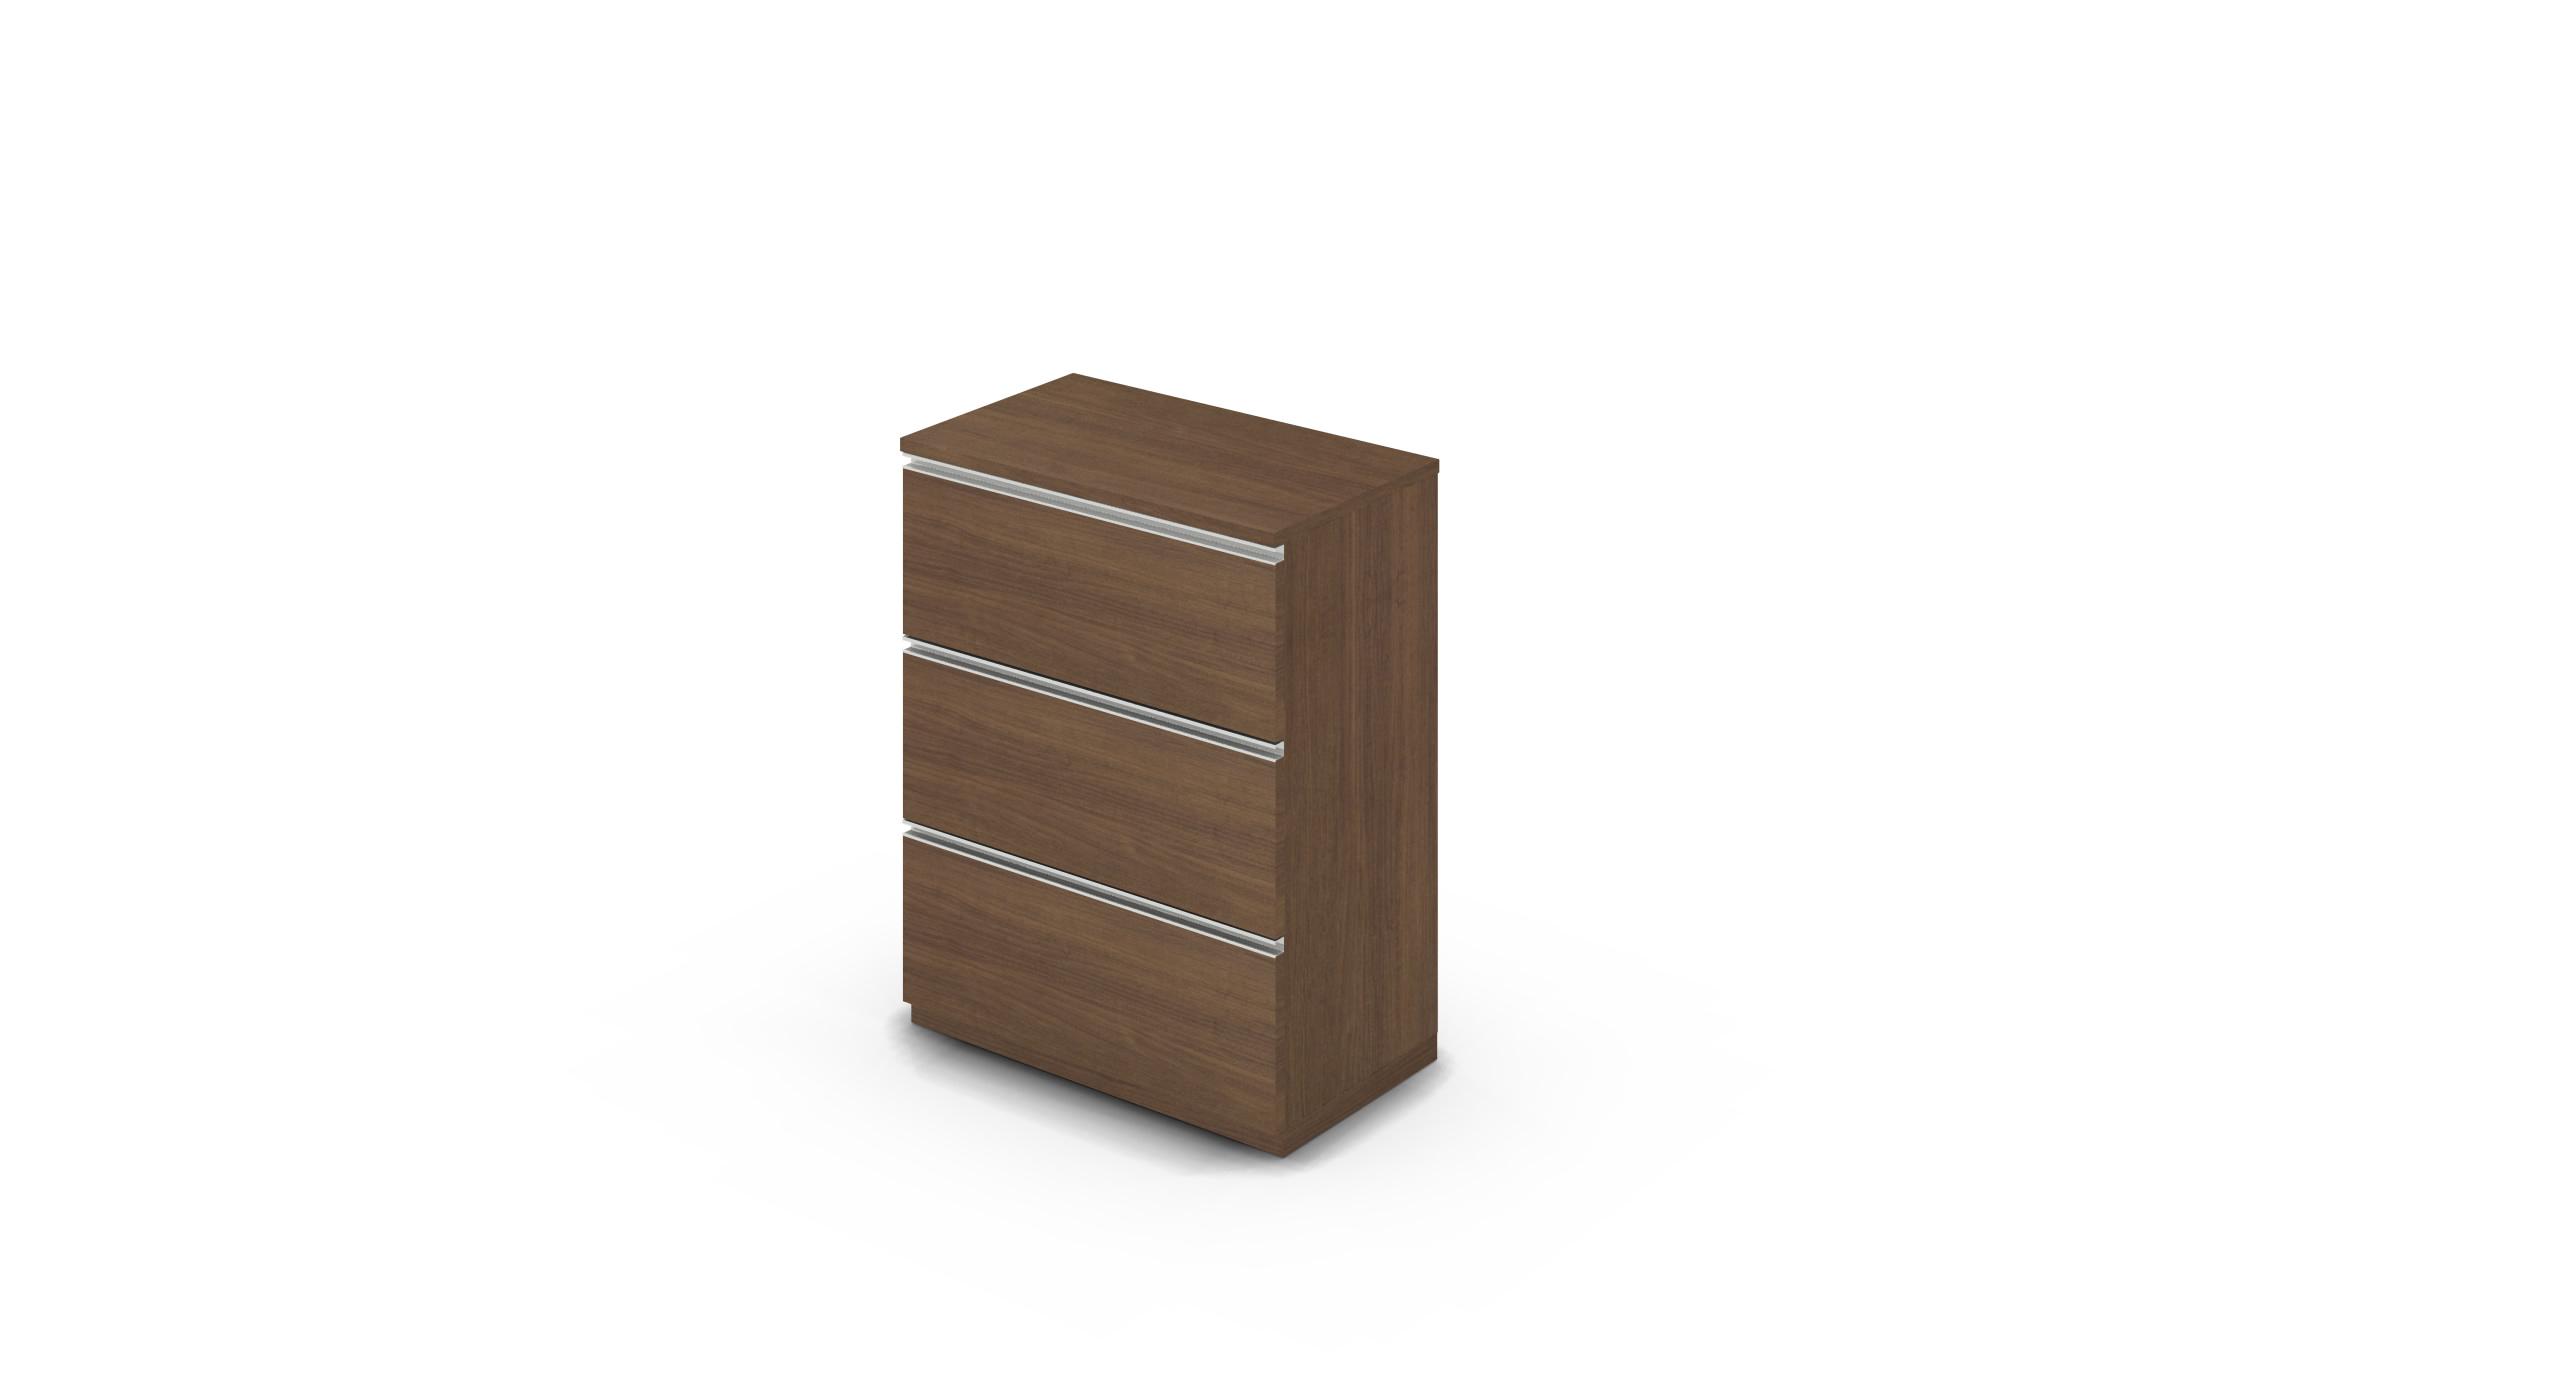 Cabinet_800x450x1125_DR_Walnut_Rail_NoCylinder